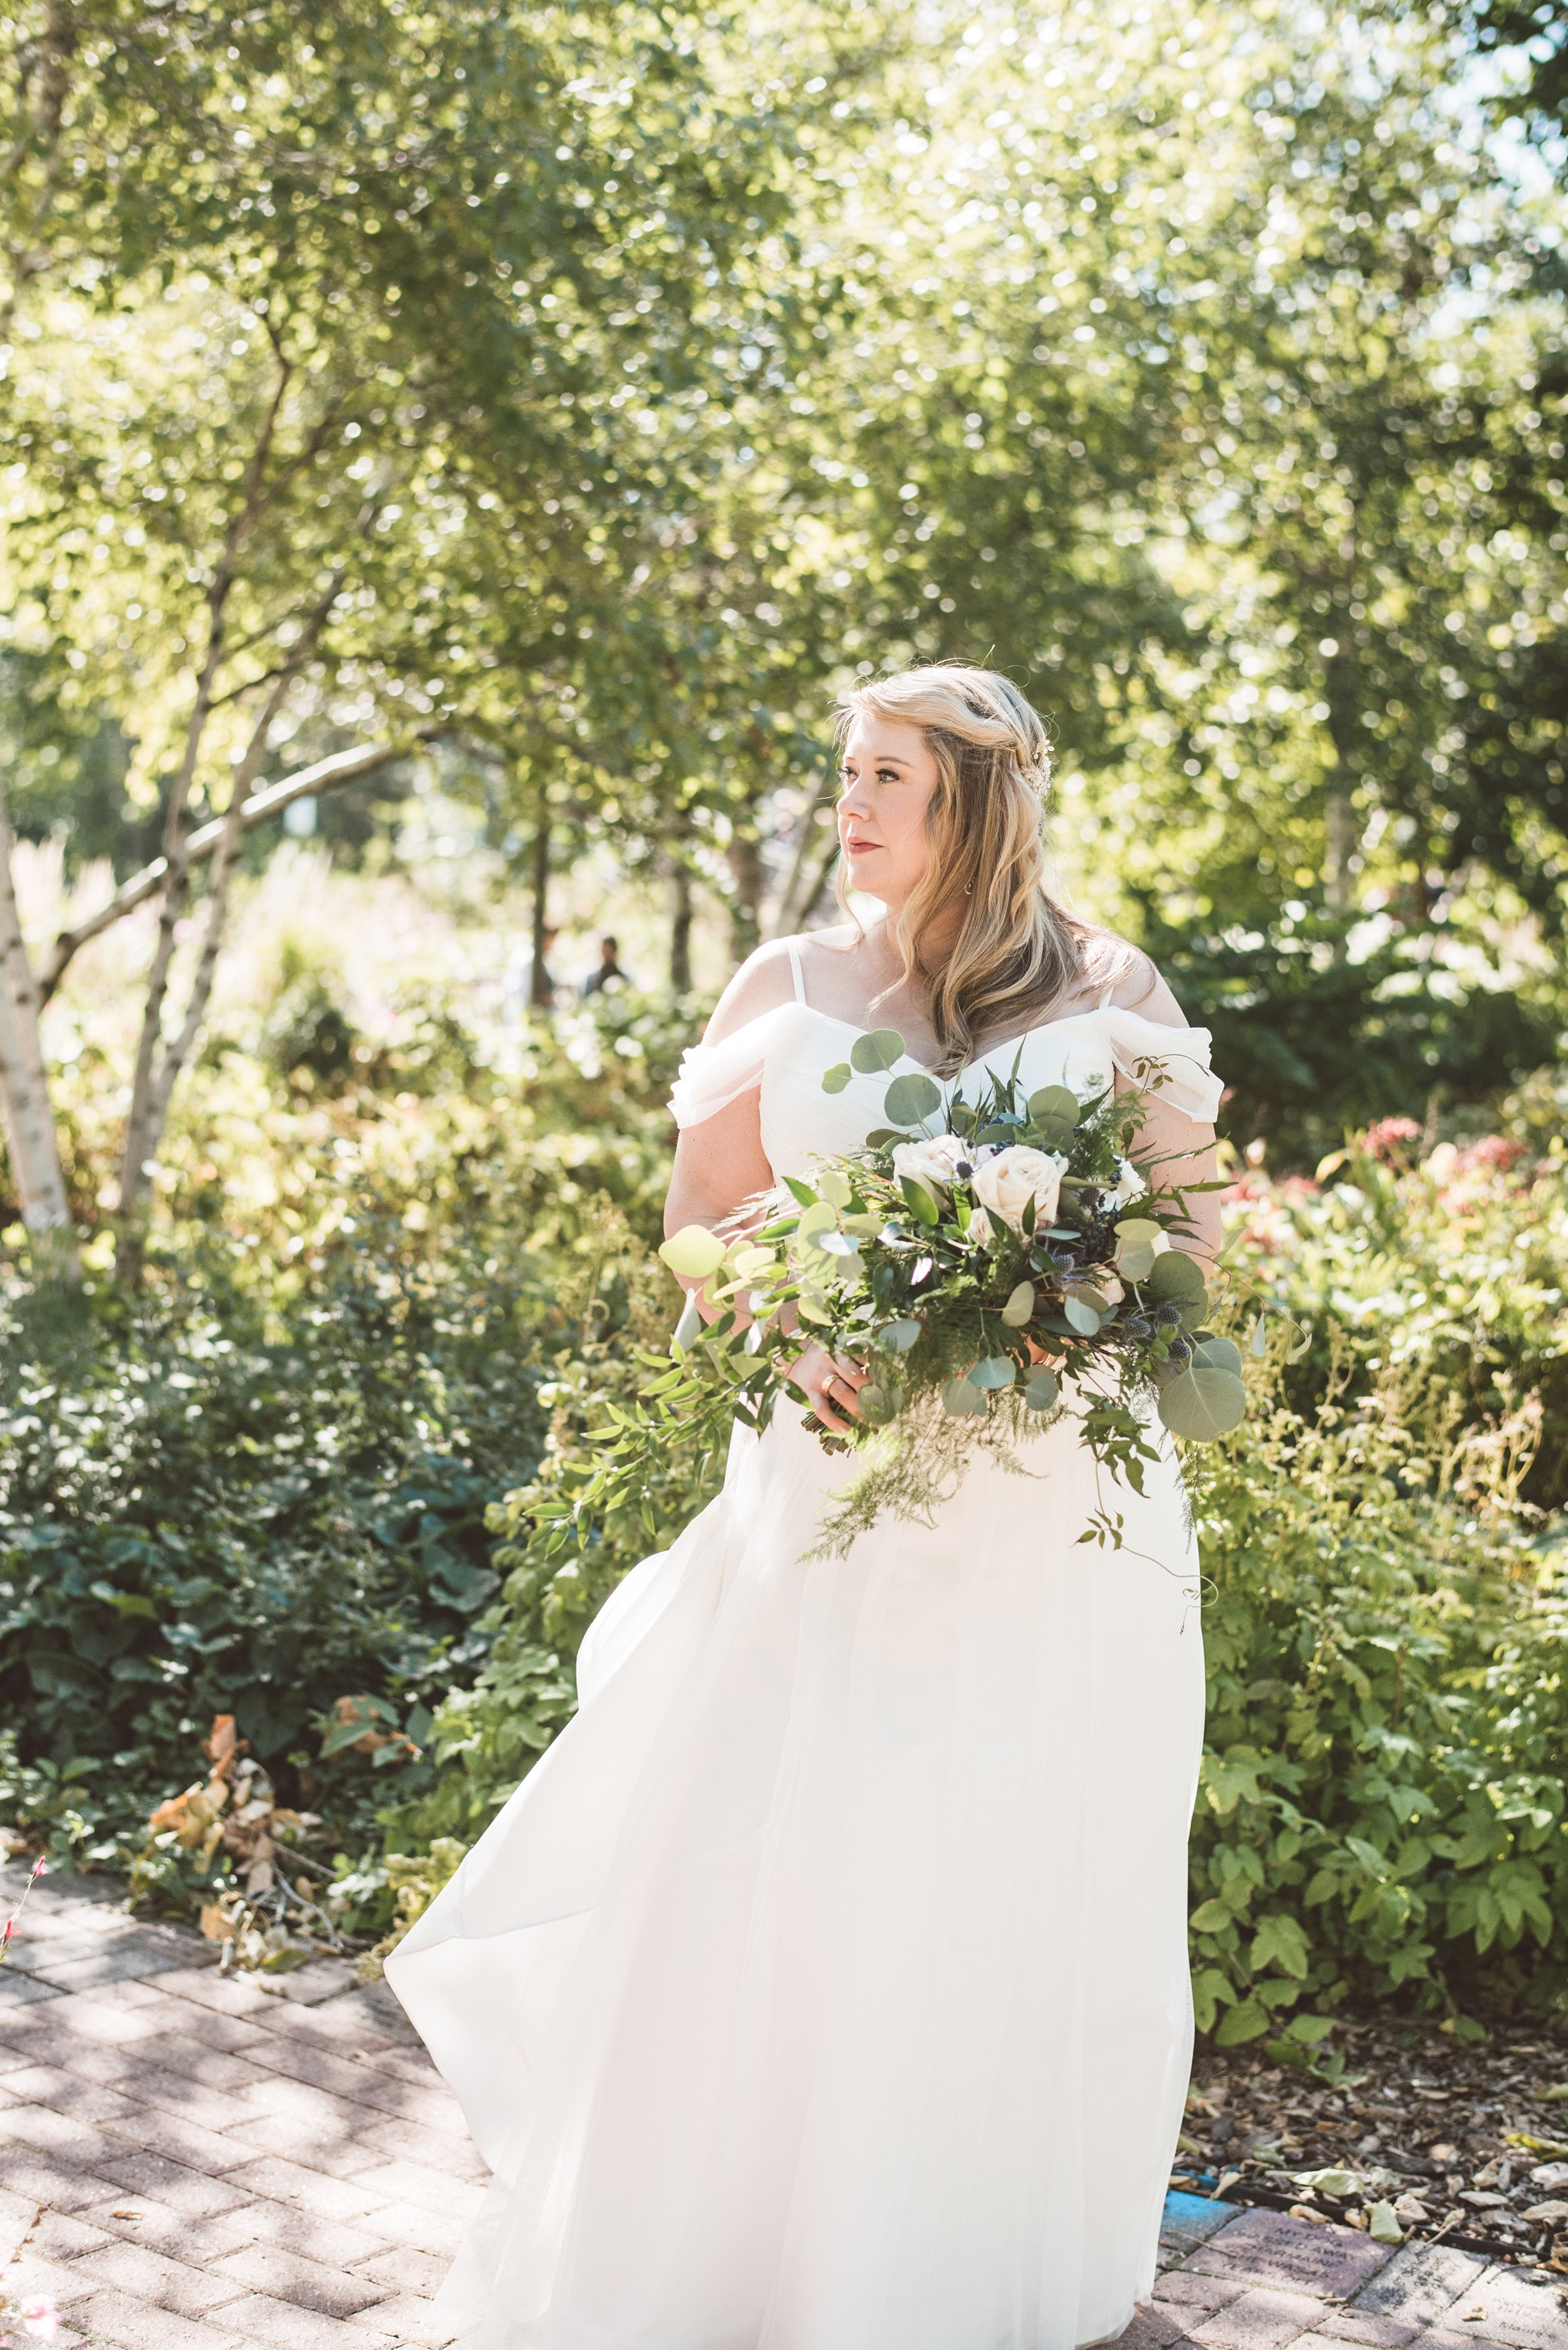 best_wedding_photography_2017_by_lucas_botz_photography_174.jpg